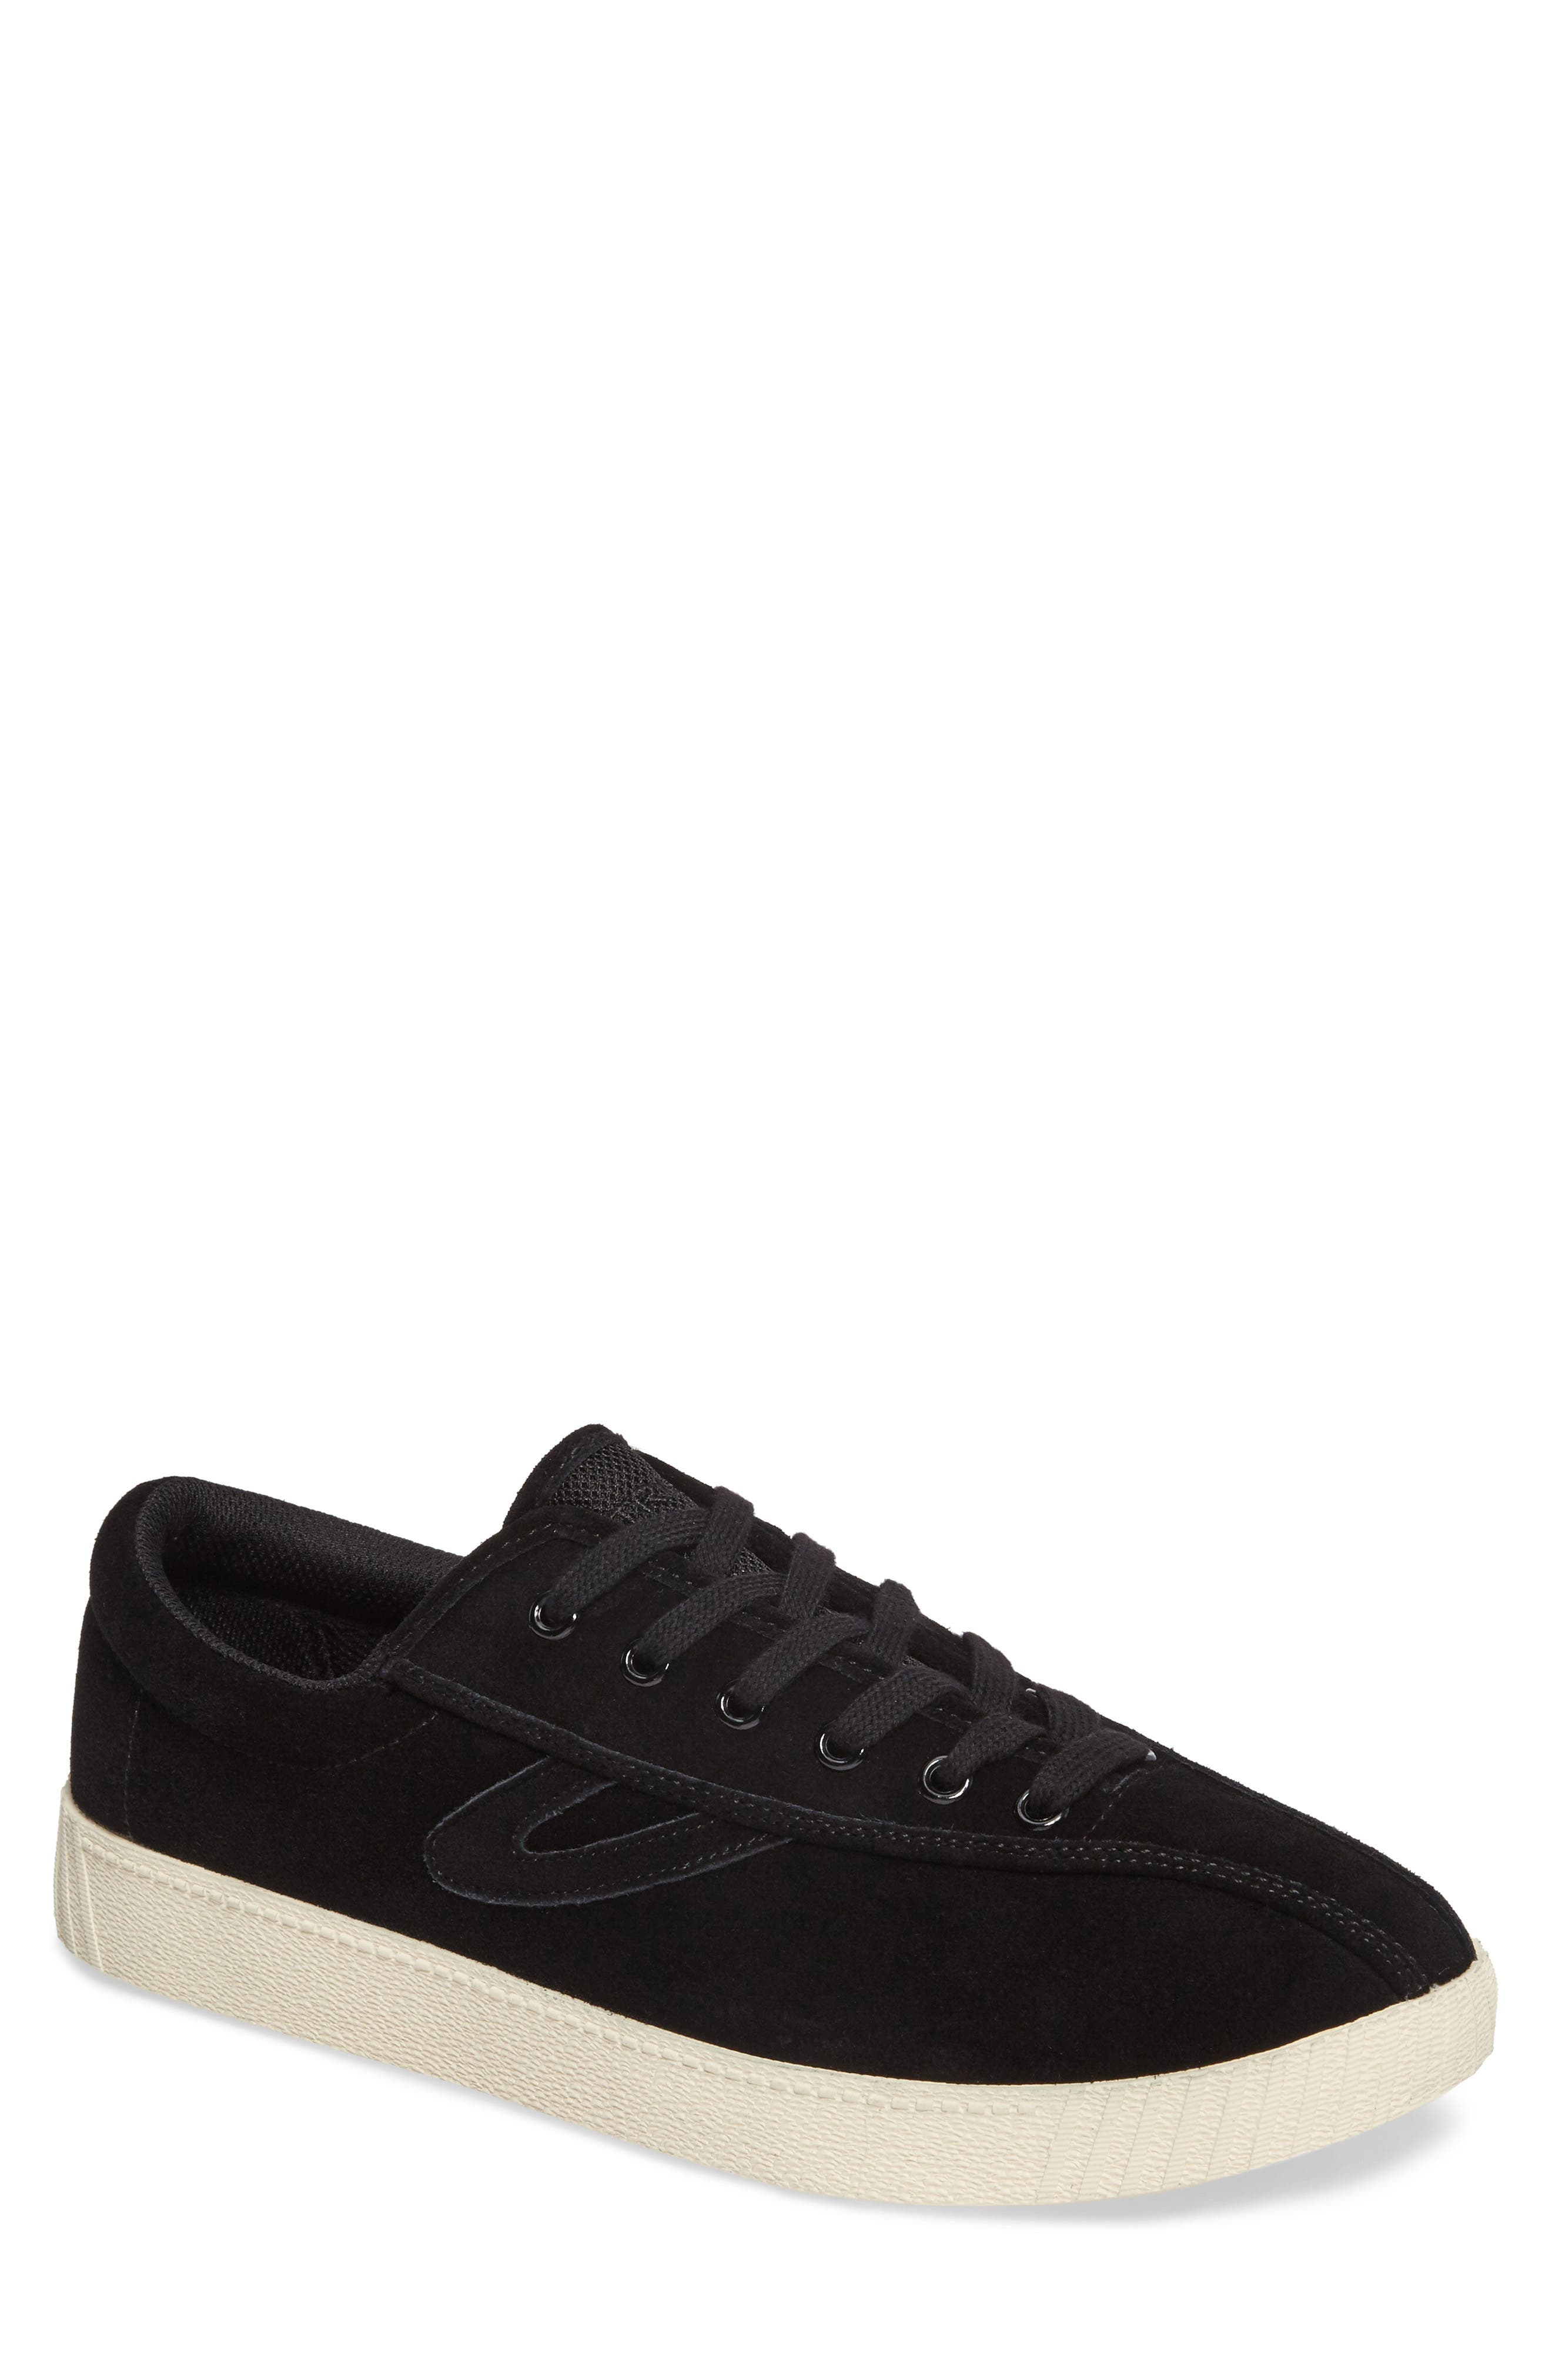 Nylite 16 Sneaker,                         Main,                         color, BLACK/ BLACK SUEDE